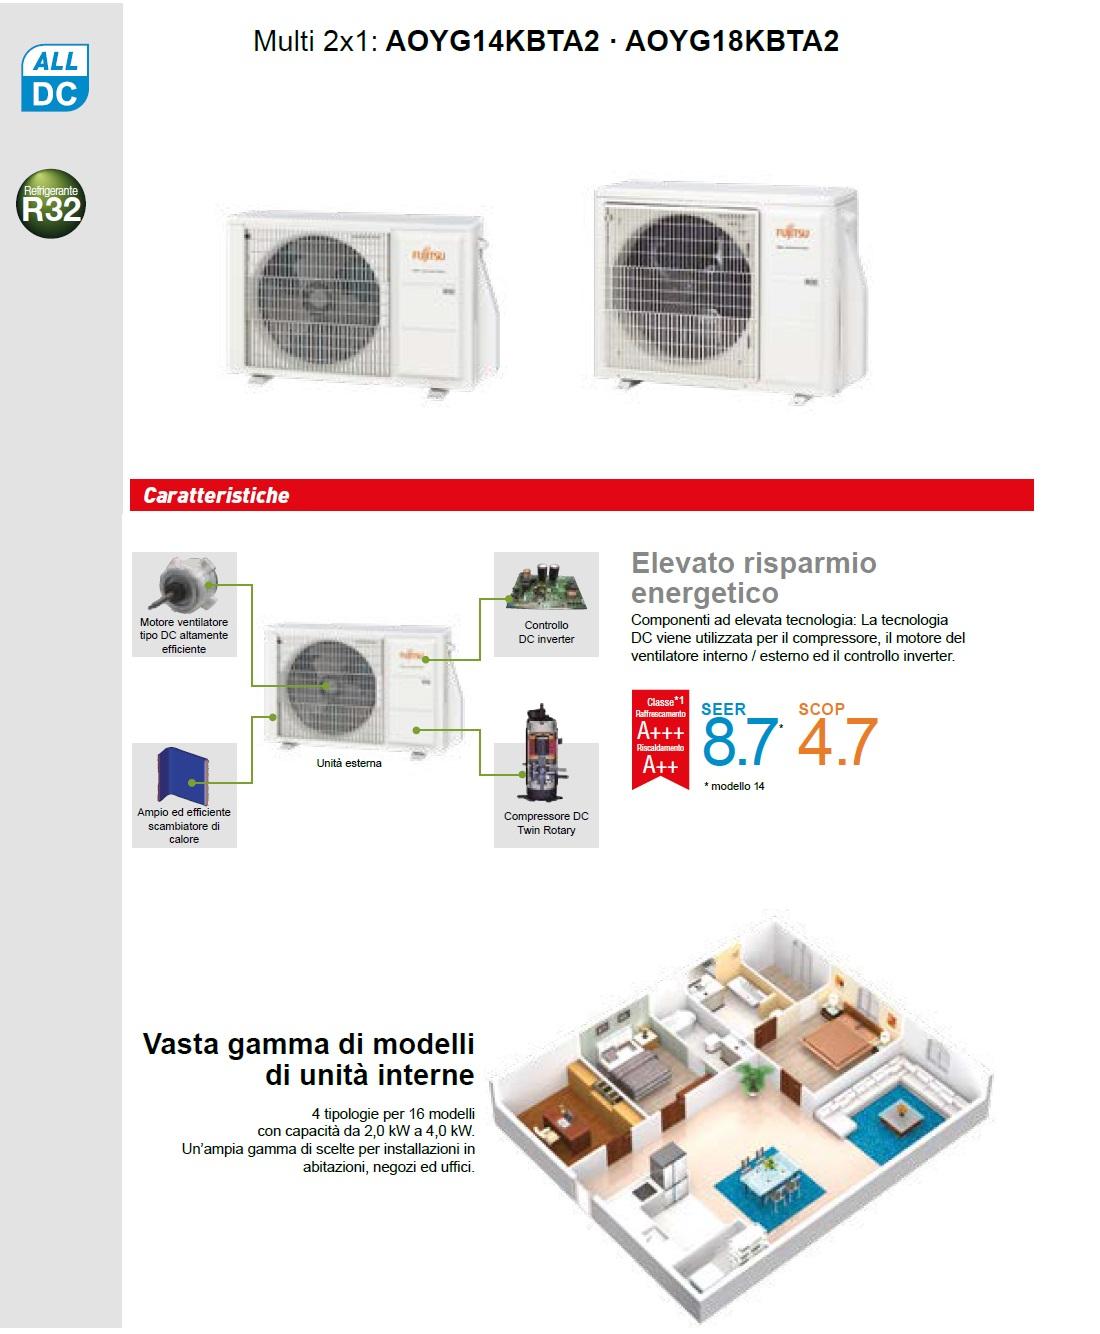 Climatizzatore Fujitsu Dual Split Parete 9+9 KE Argento AOYG18KBTA2